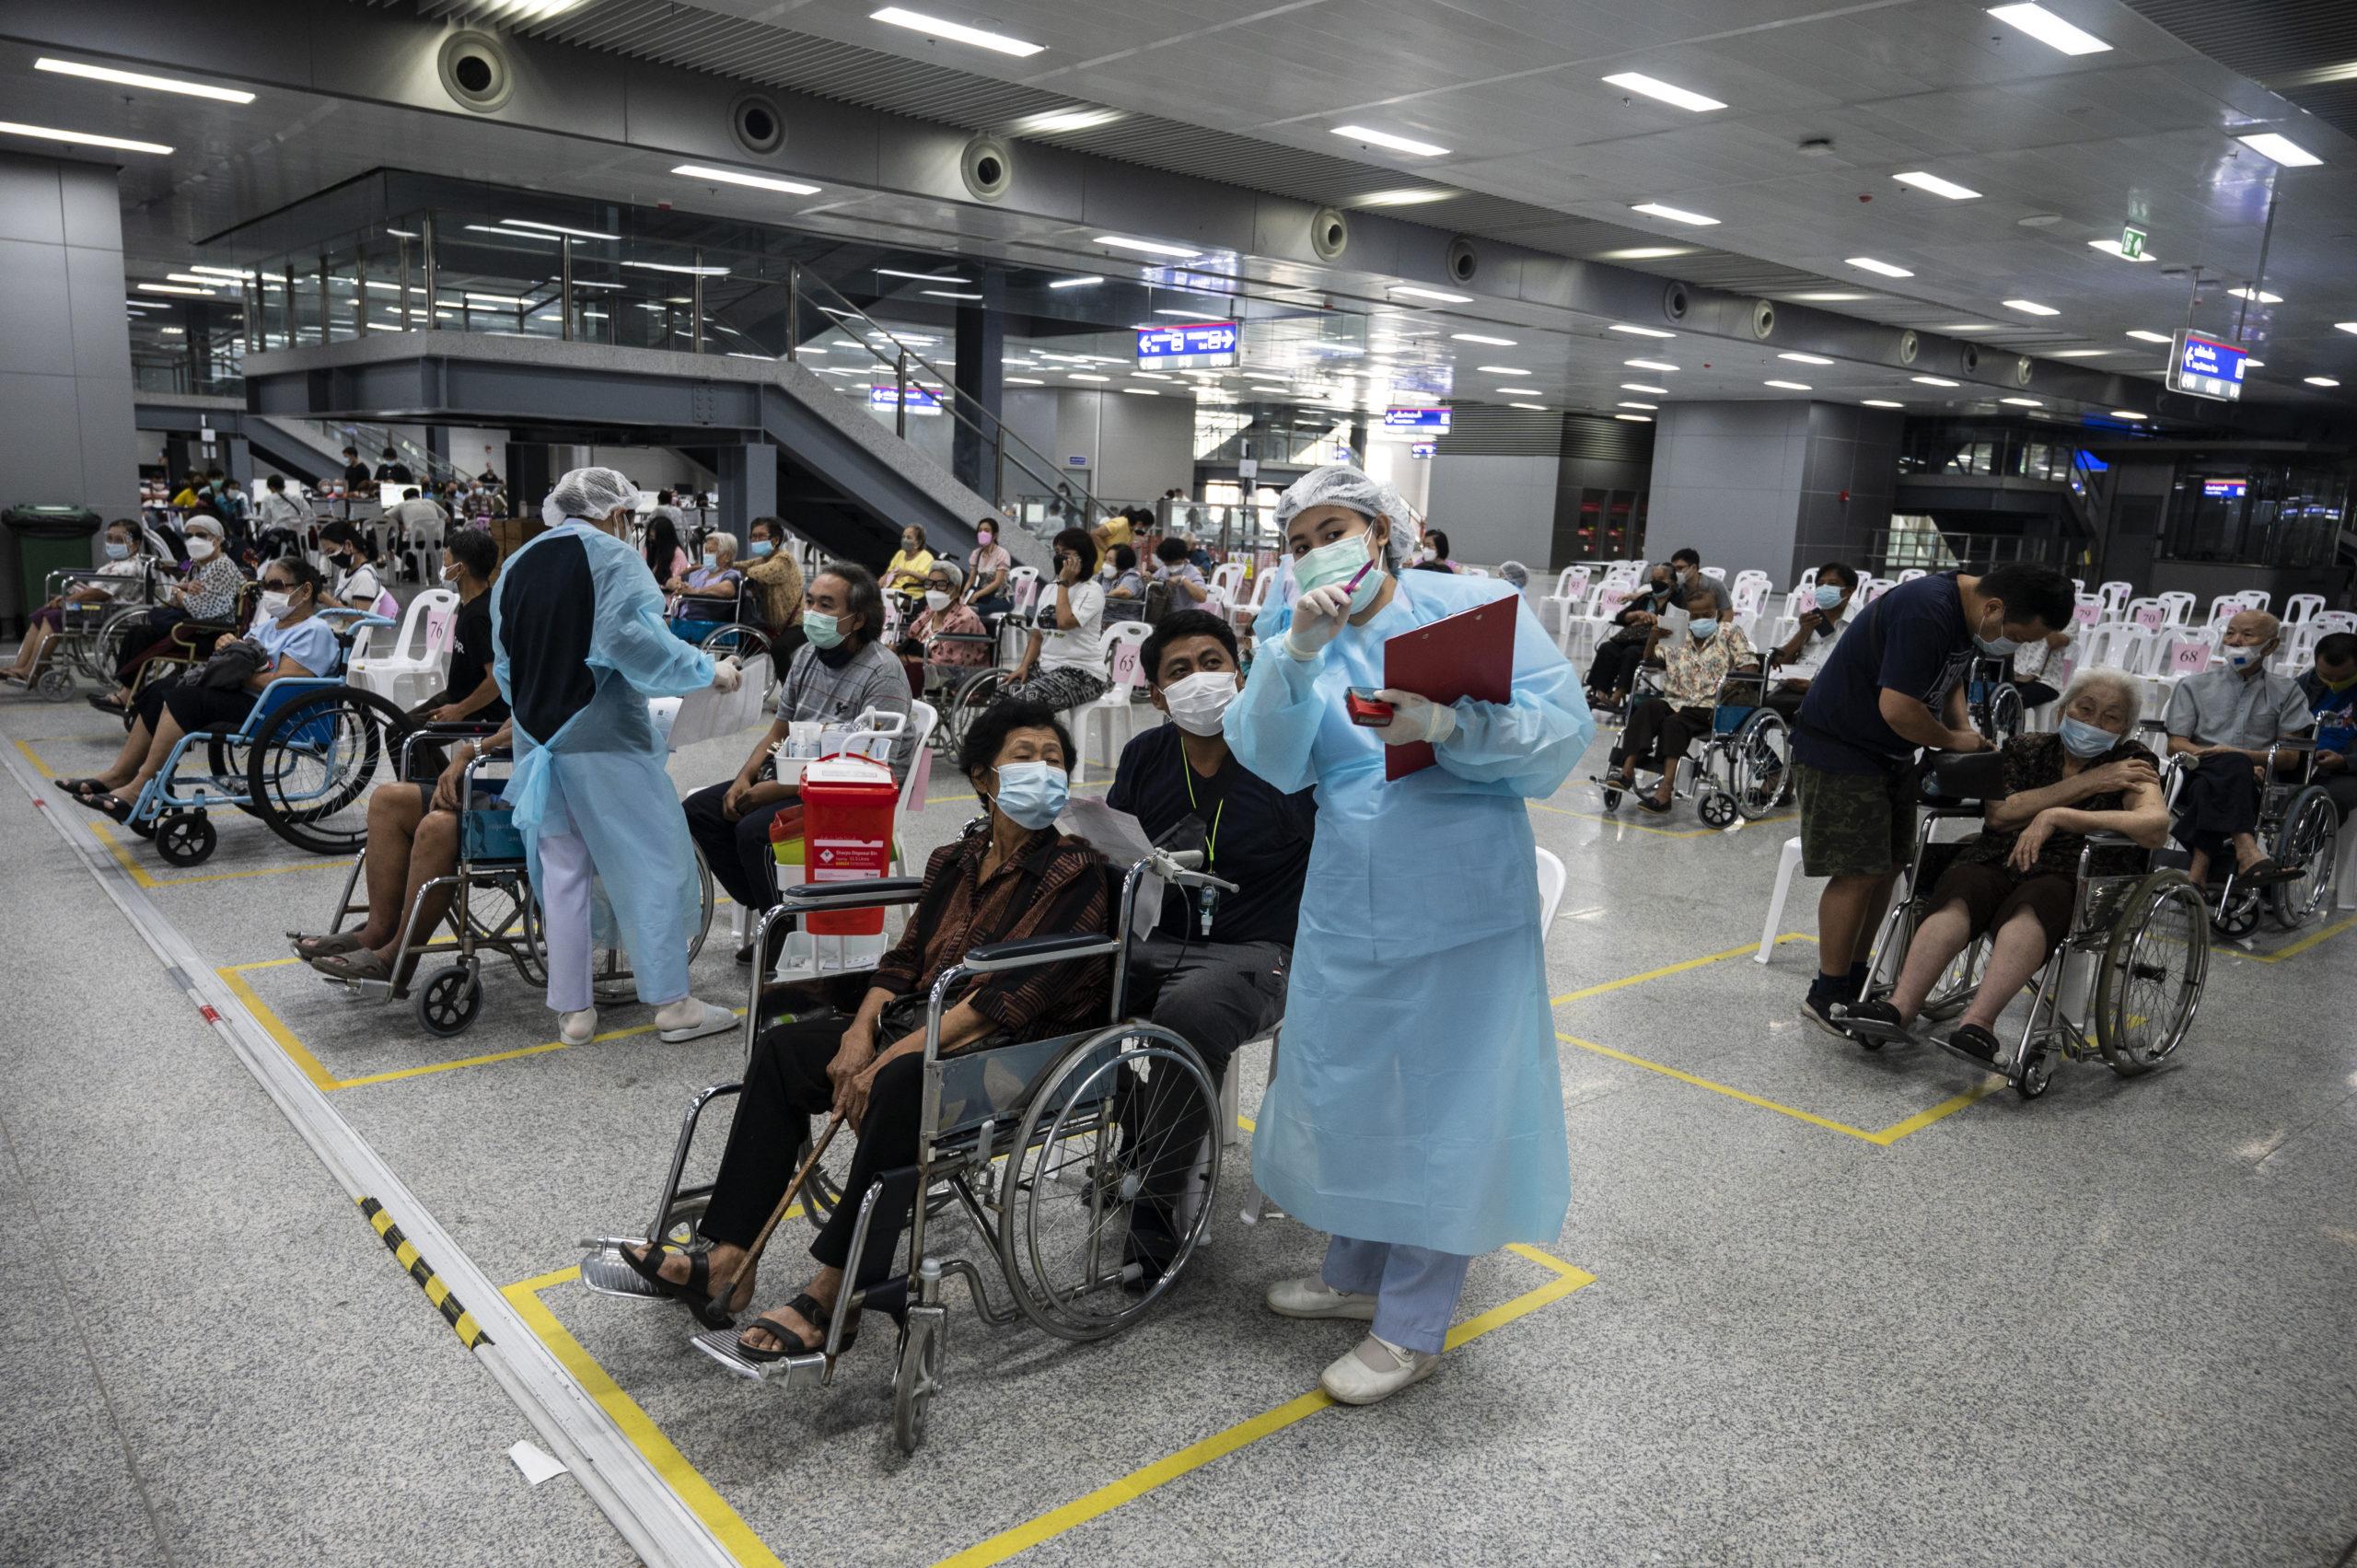 People wait in line to receive the AstraZeneca coronavirus vaccine in Bangkok, Thailand on July 13. (Sirachai Arunrugstichai/Getty Images)